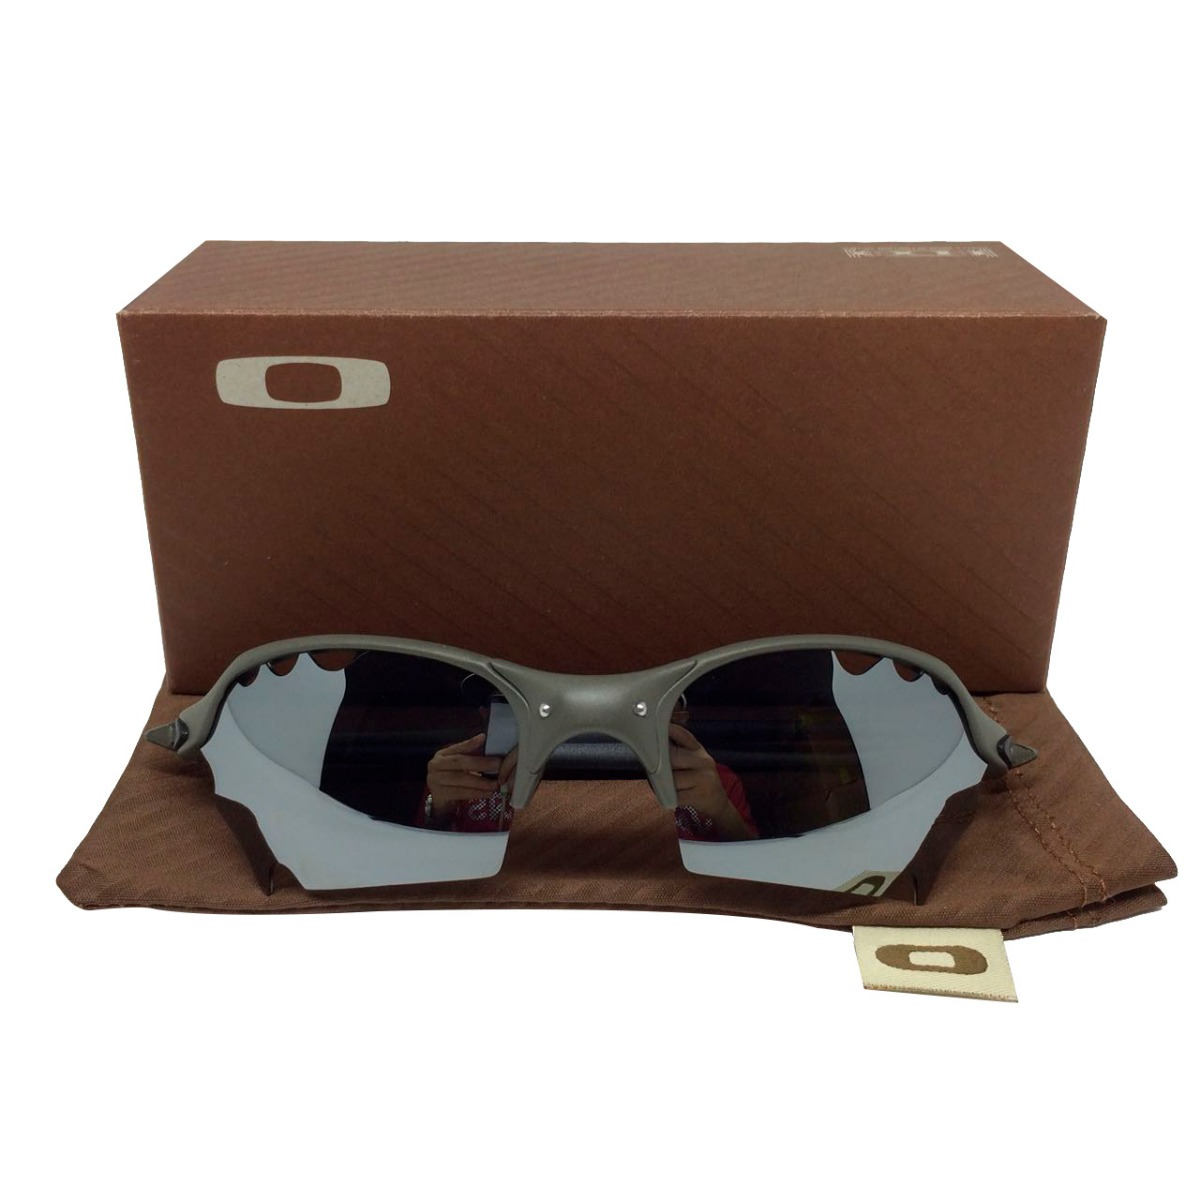 fa6ccc8487637 Óculos Oakley Romeo2 Parriot Vendet Cinza Lente Preta - R  159,99 em ...